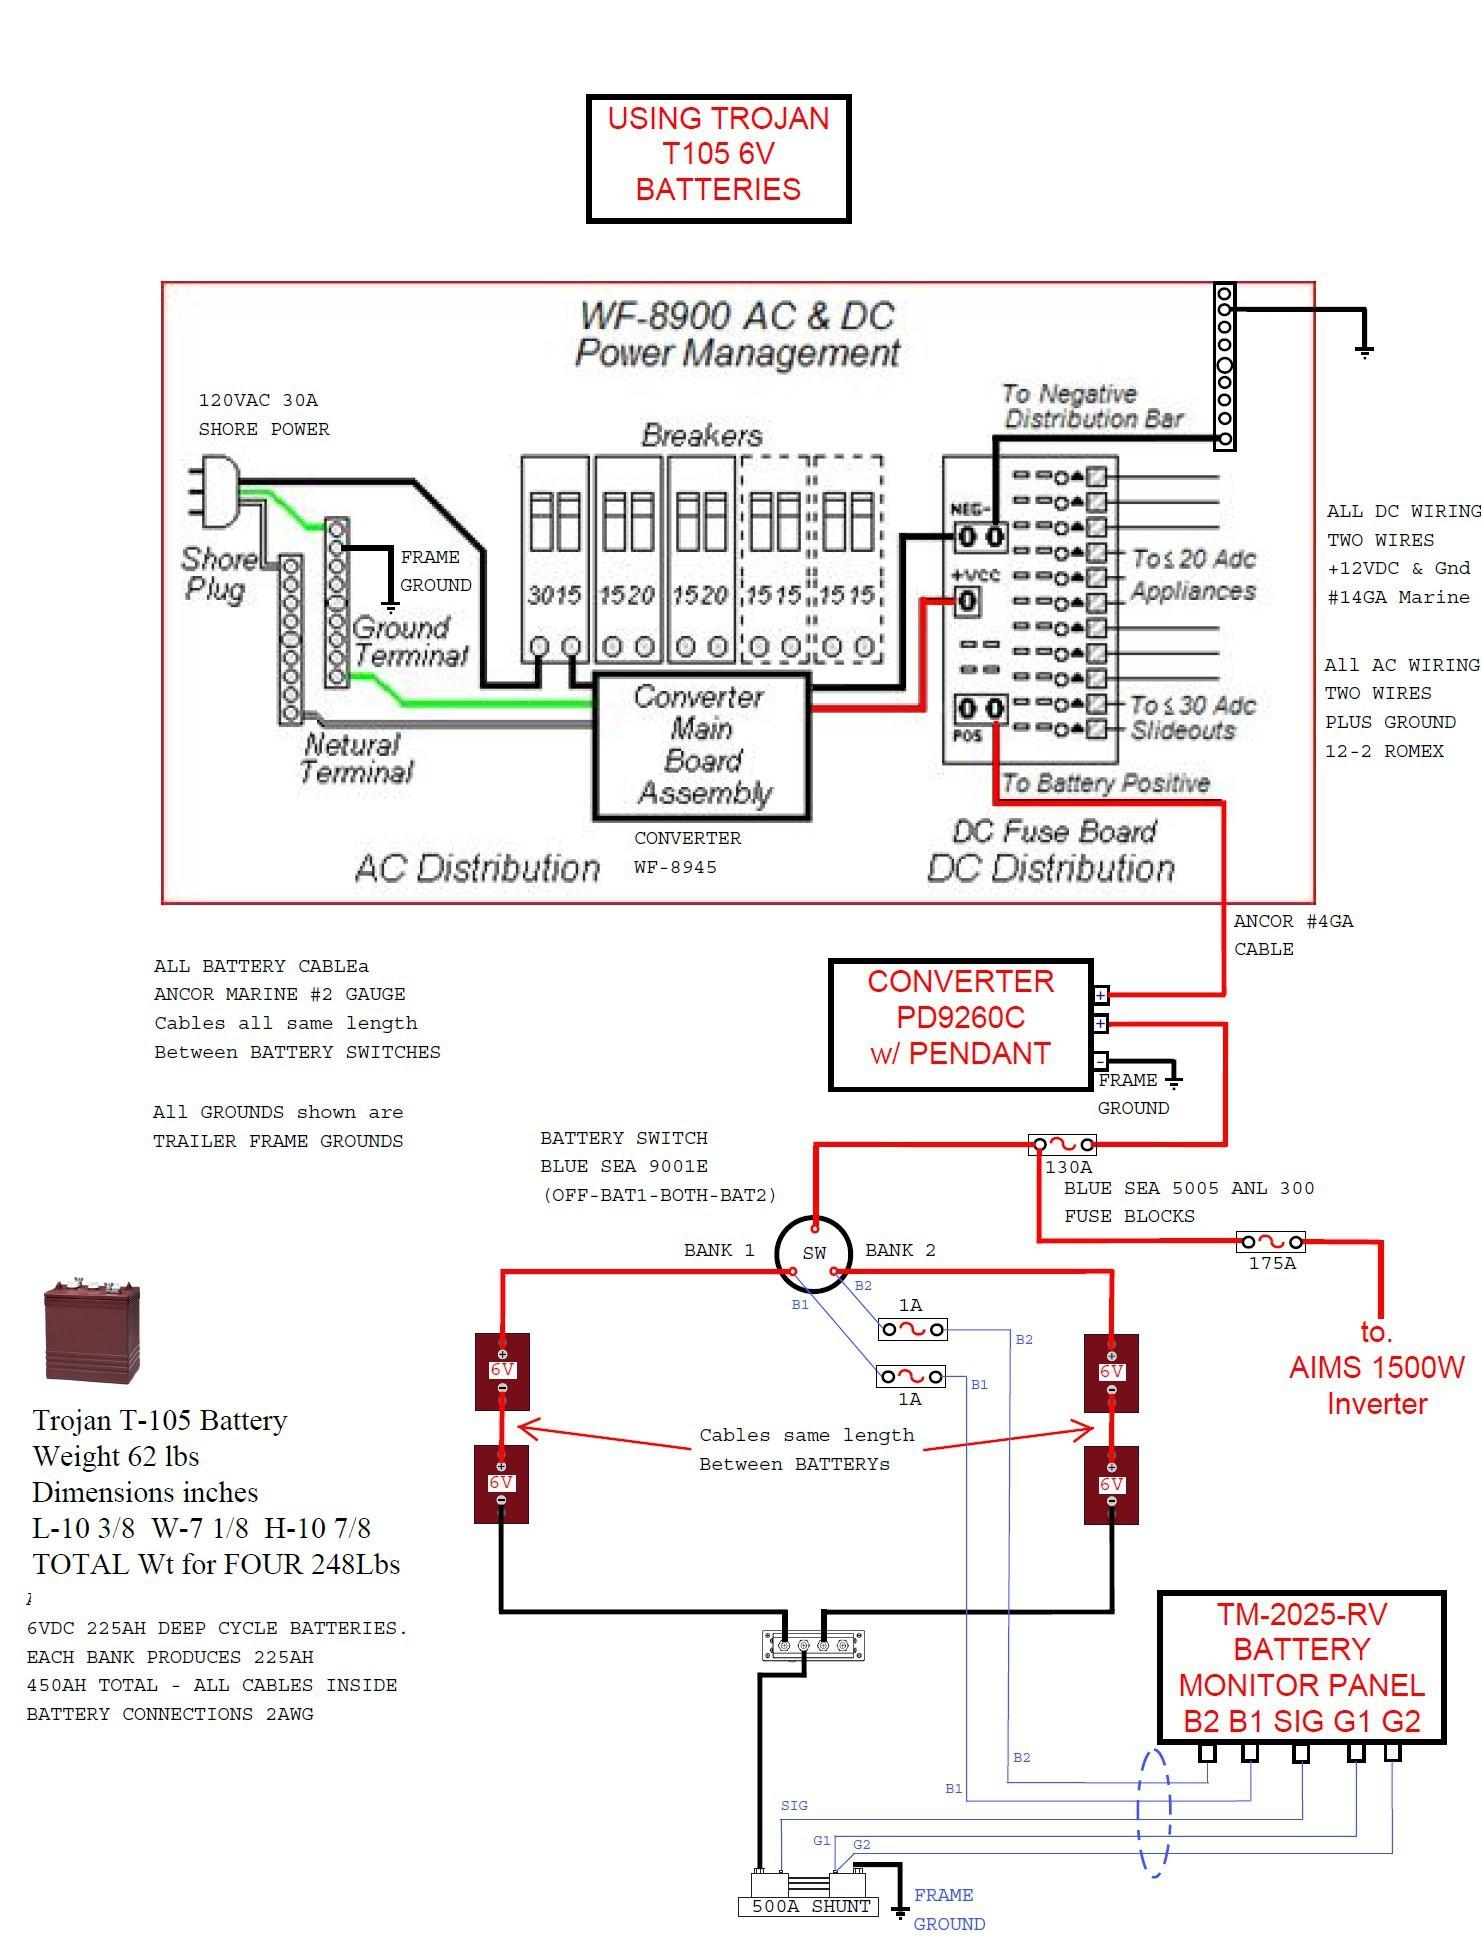 Rv Monitor Panel Wiring Diagram Unique Kib Micro Monitor Wiring Diagram Electrical Drawing Wiring Diagram